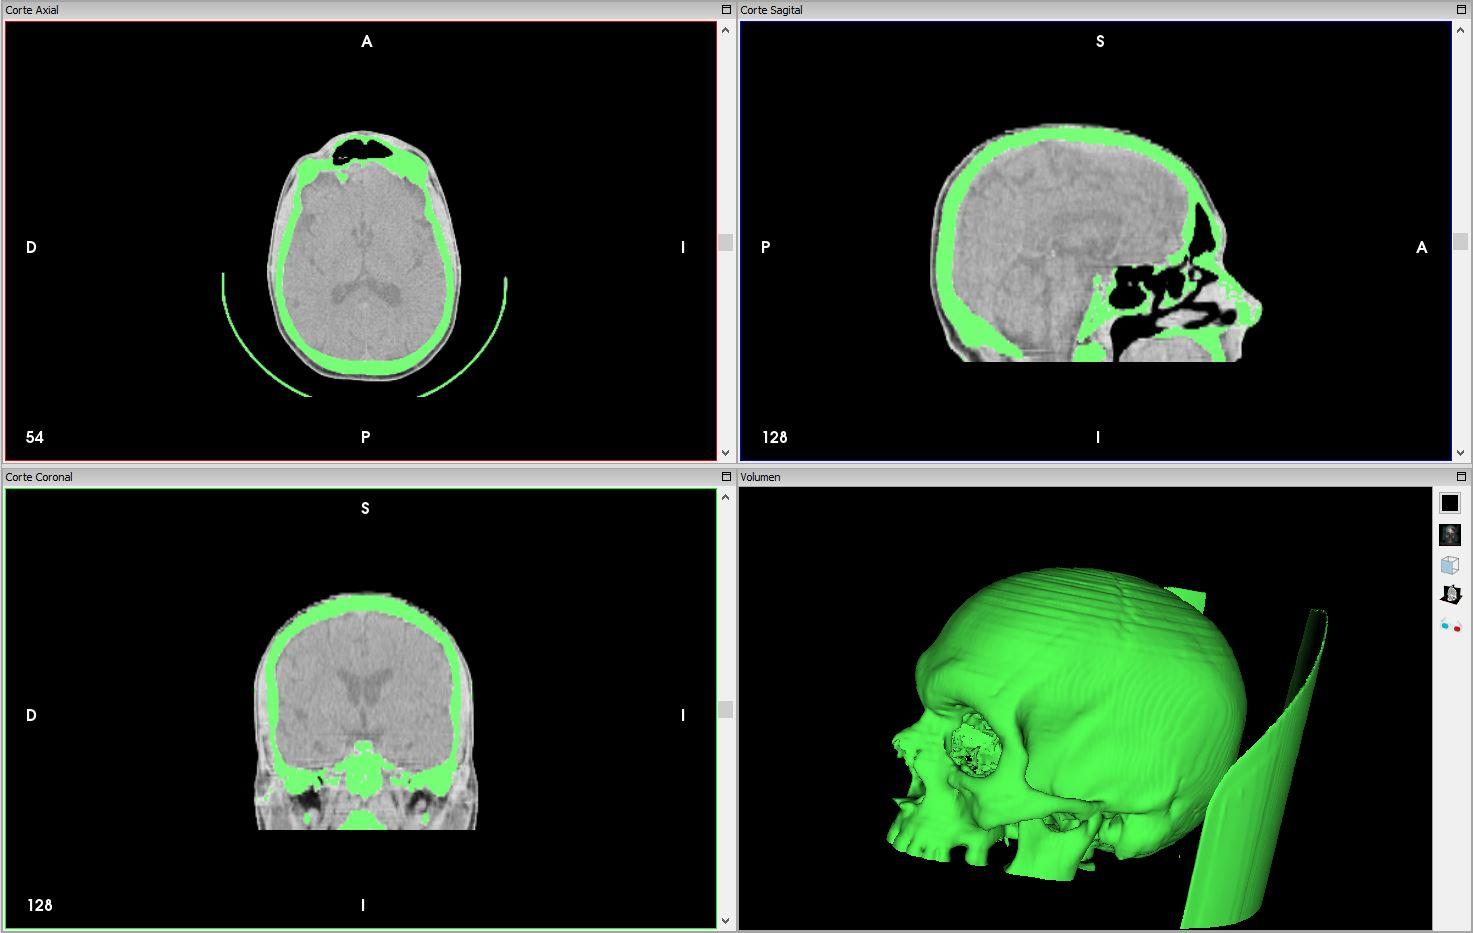 Impresión 3D de maxilar a partir de una resonancia magnética